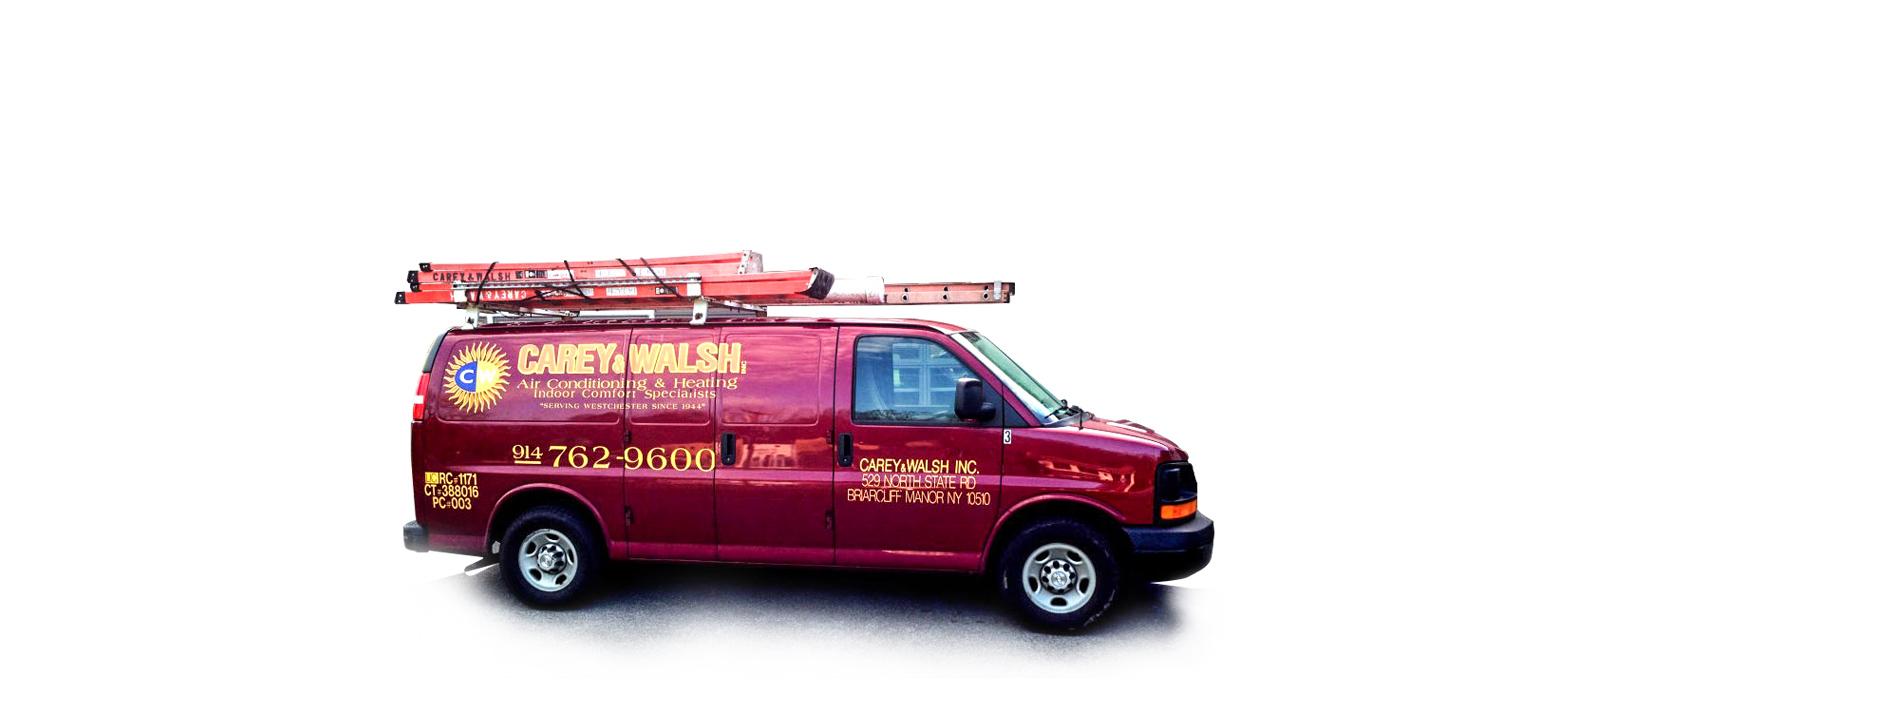 Carey Walsh Slider V on Air Pump Repair Rockland On